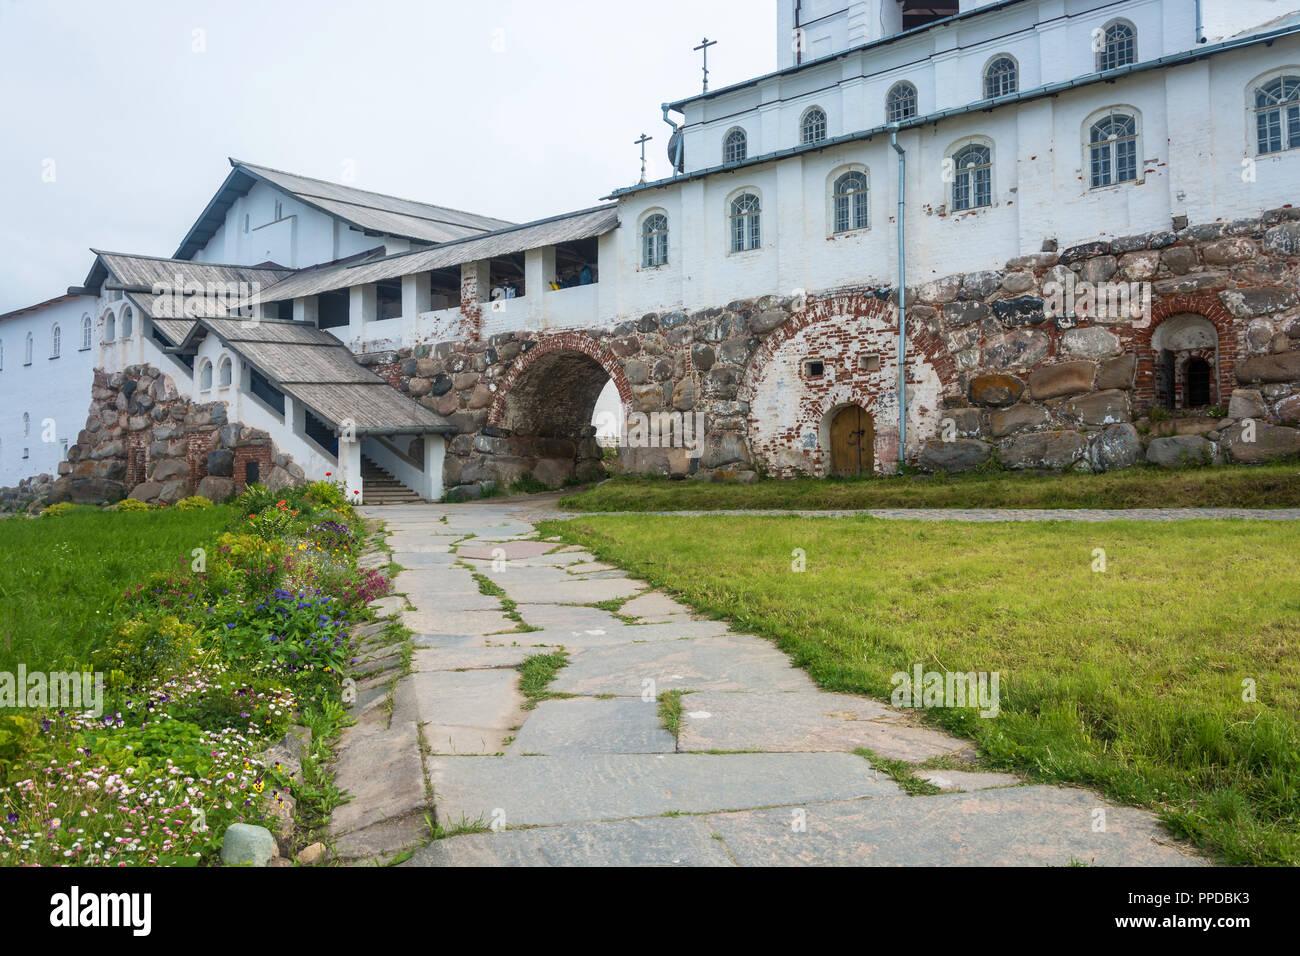 In the courtyard of the Spaso-Preobrazhensky Solovetsky monastery, Arkhangelsk oblast, Russia. Stock Photo